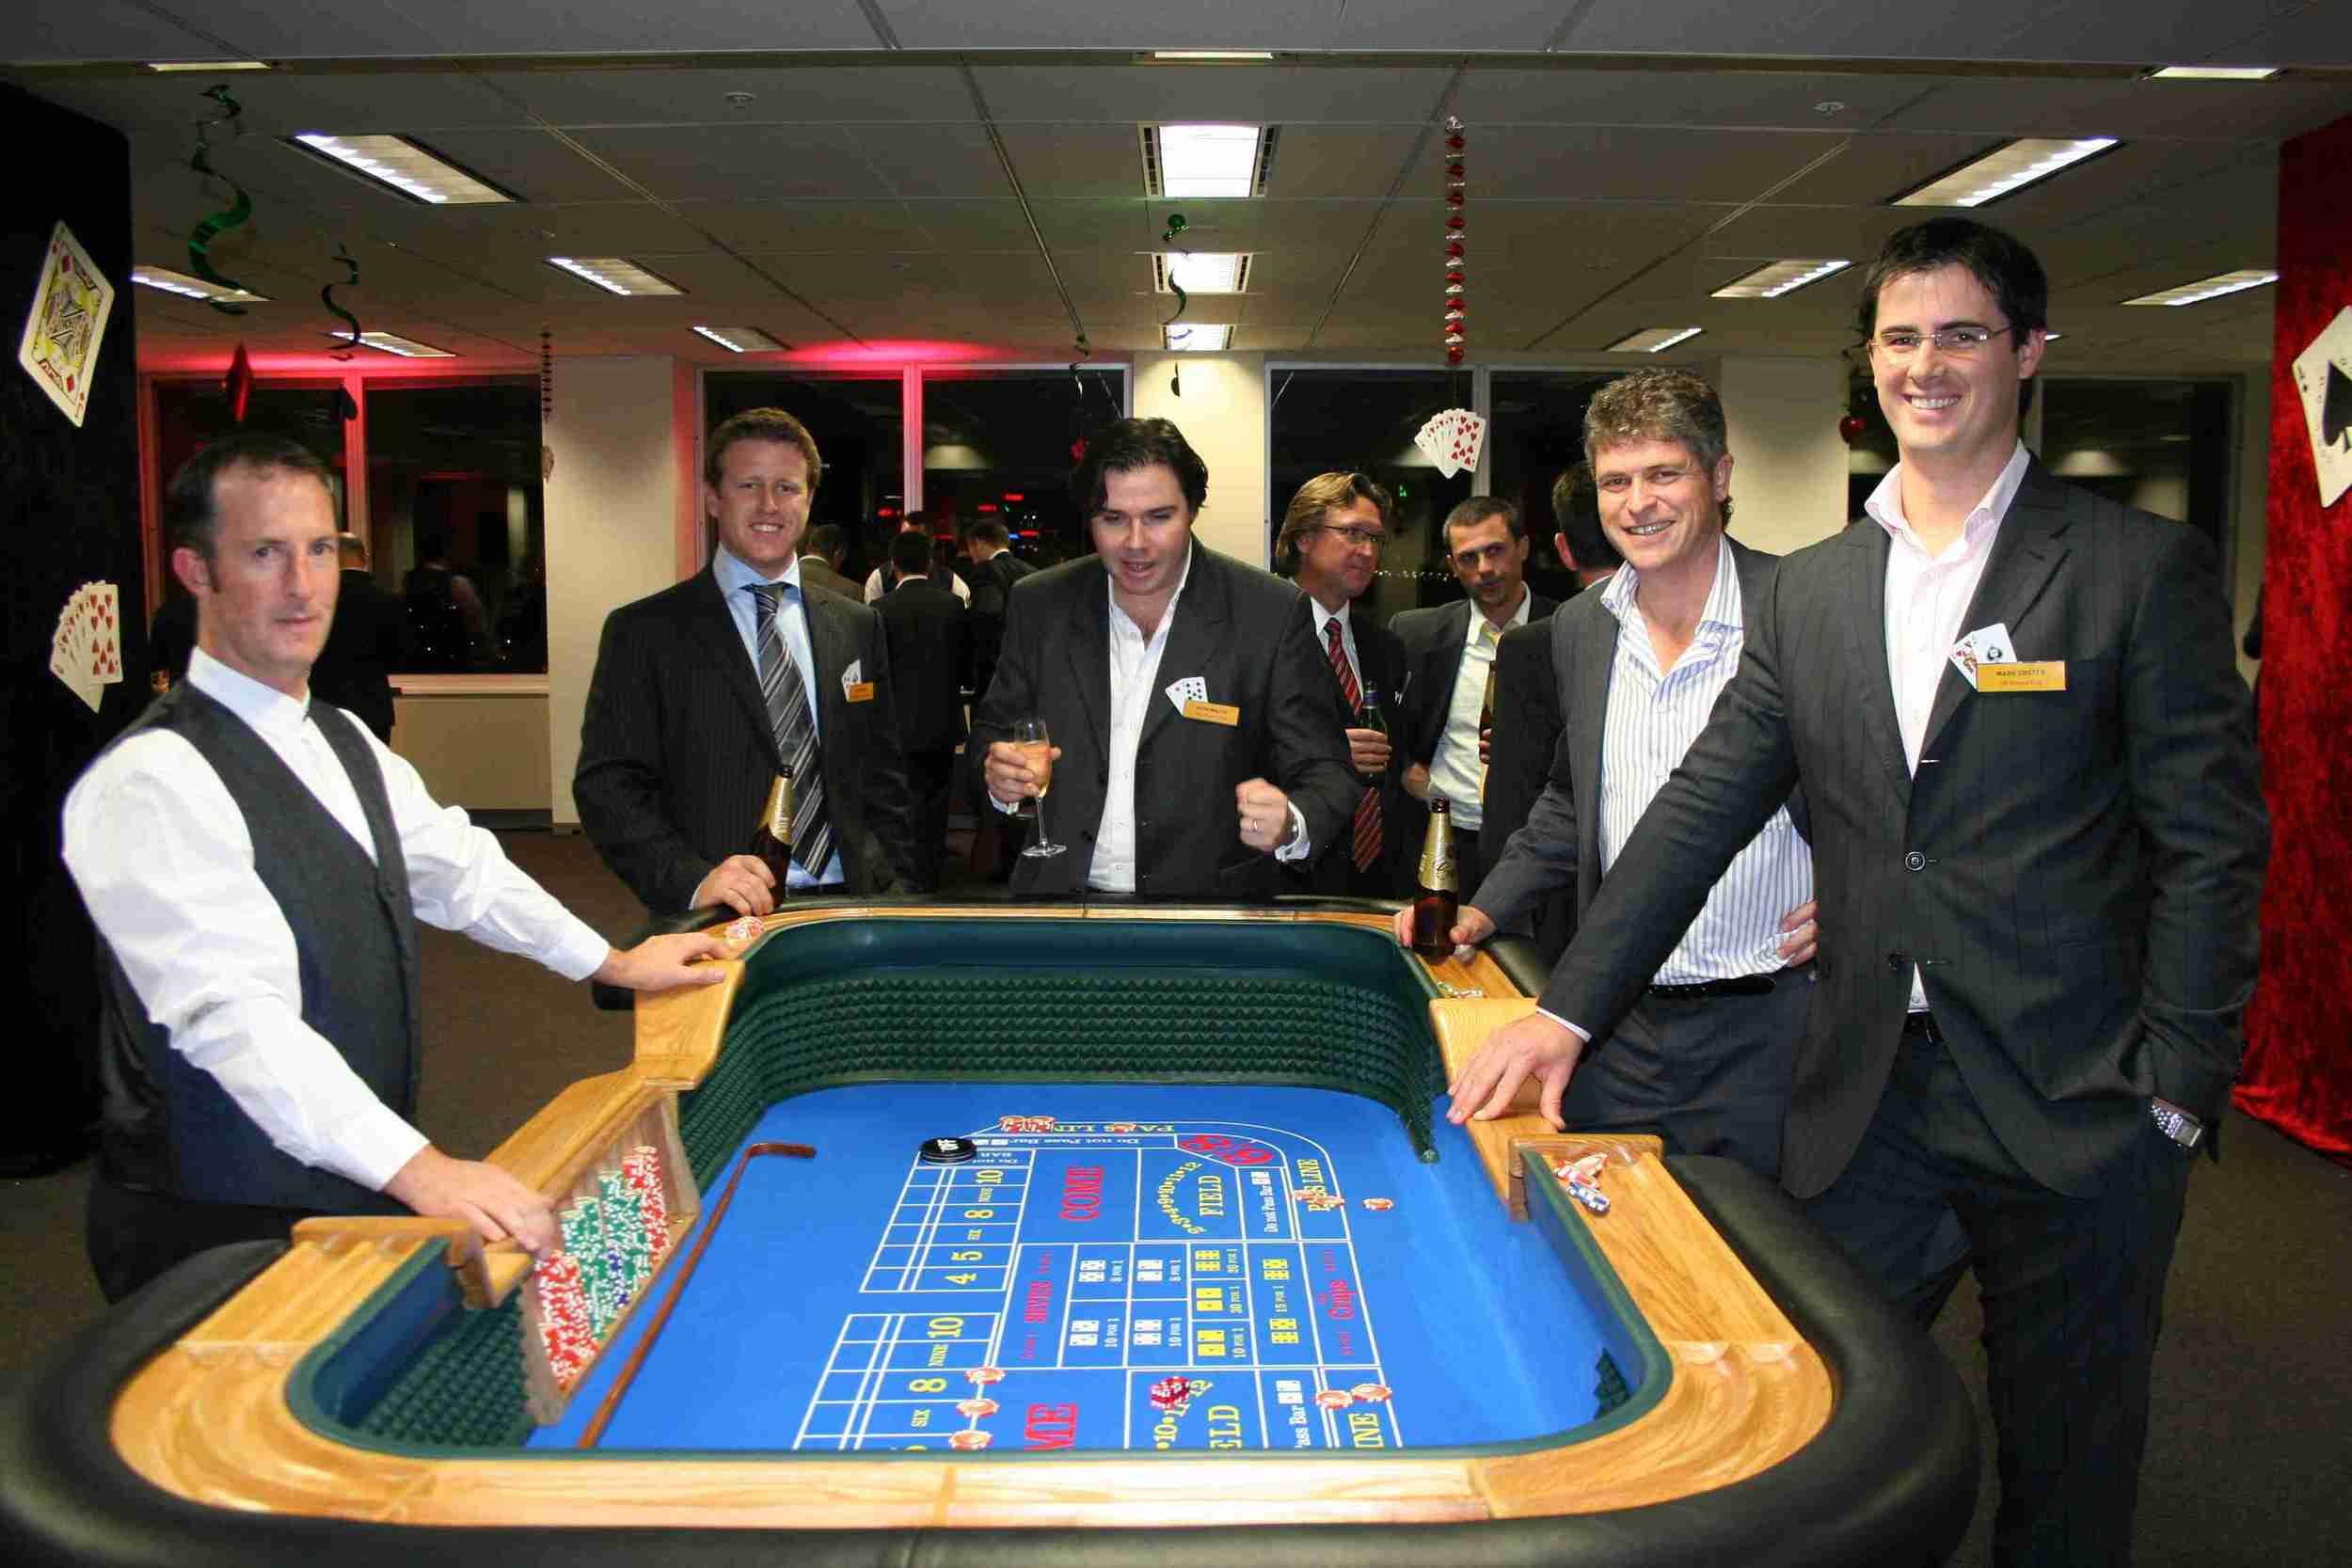 casinonights3.jpg